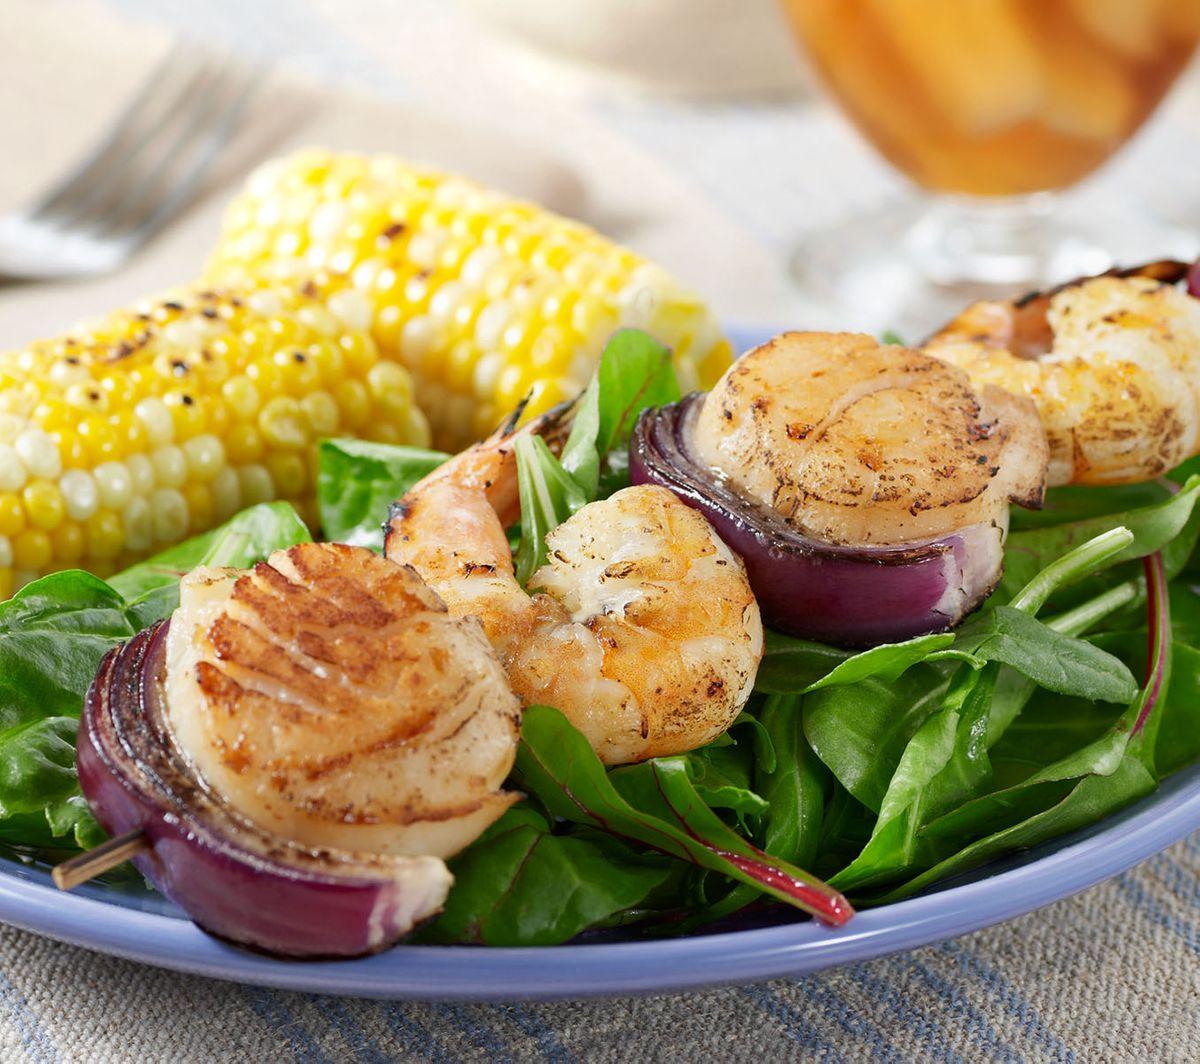 Shrimp with corn